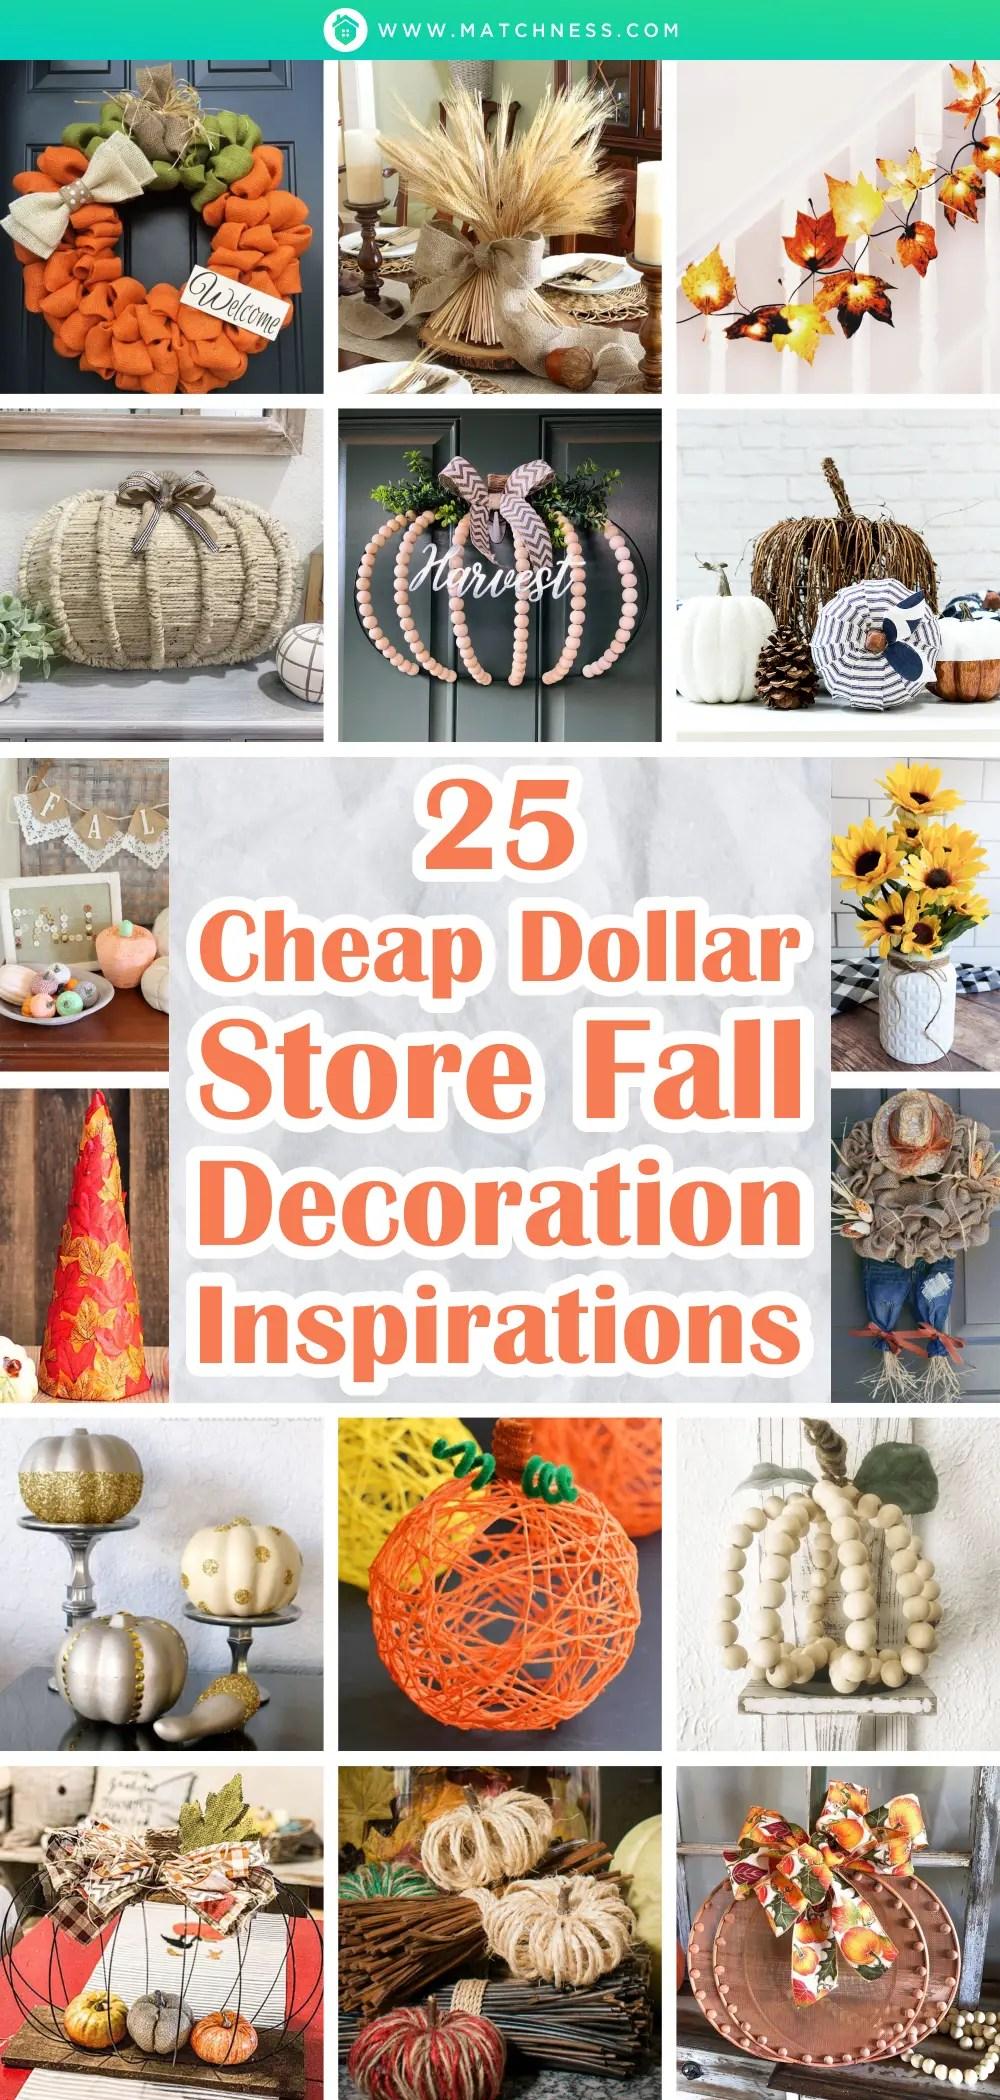 25-cheap-dollar-store-fall-decoration-inspirations1